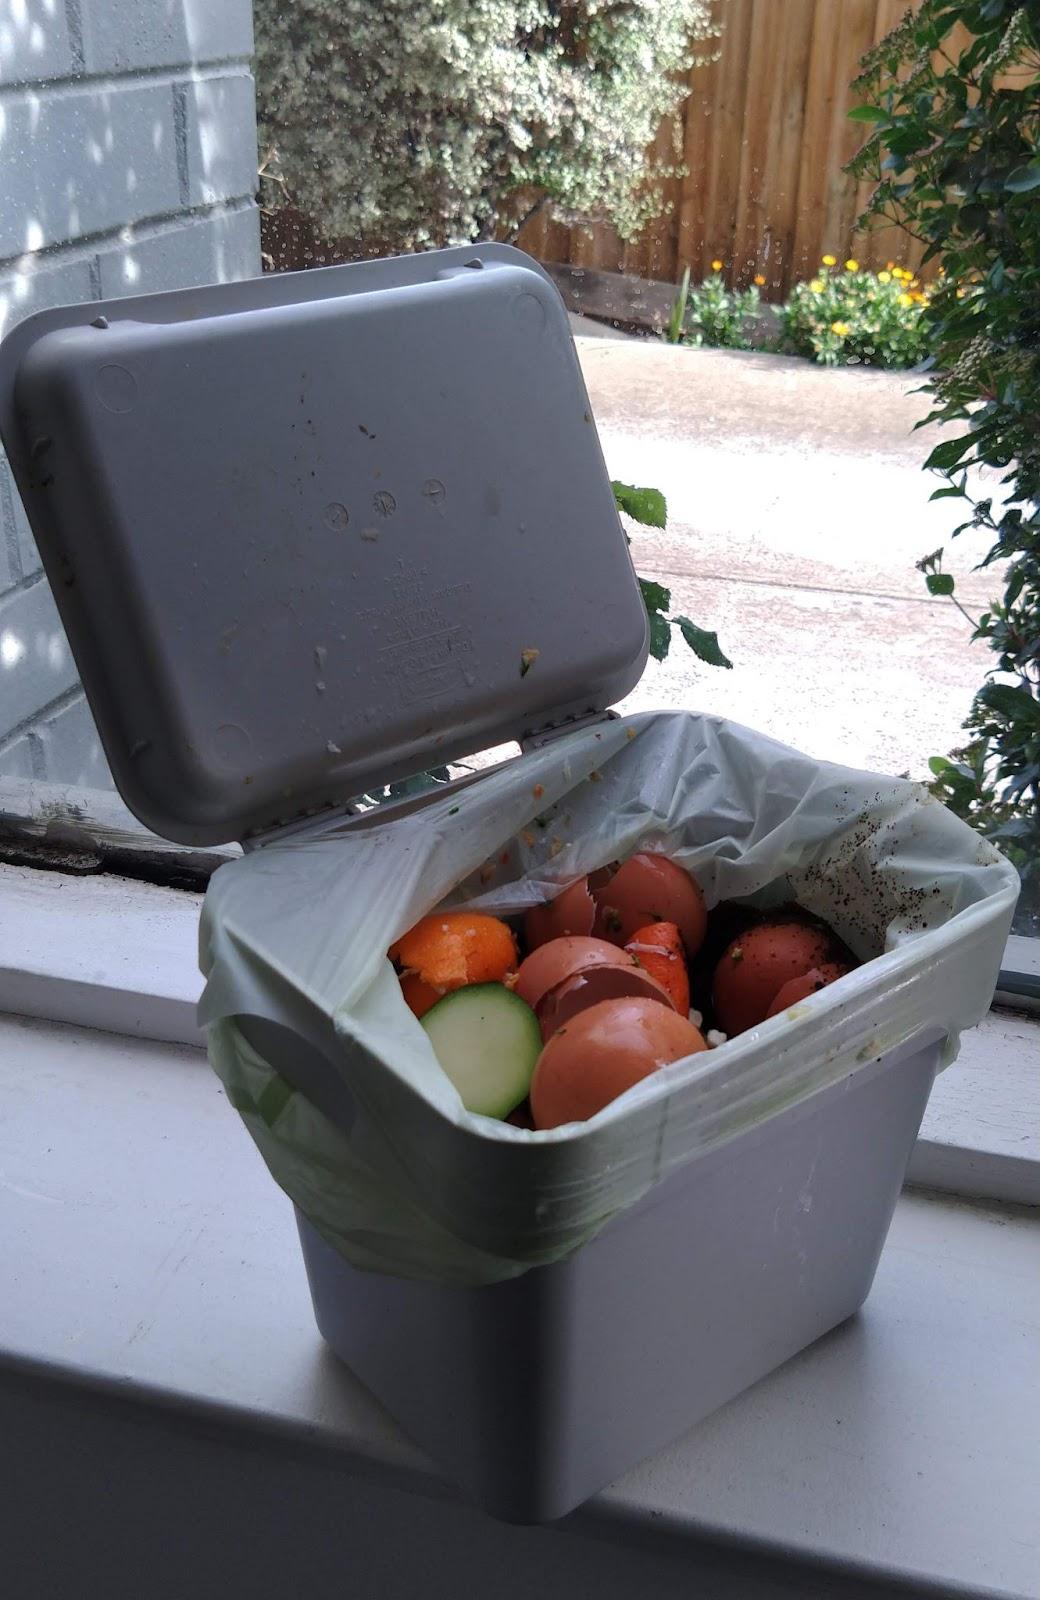 Food waste Caddy - Brunswick Daily